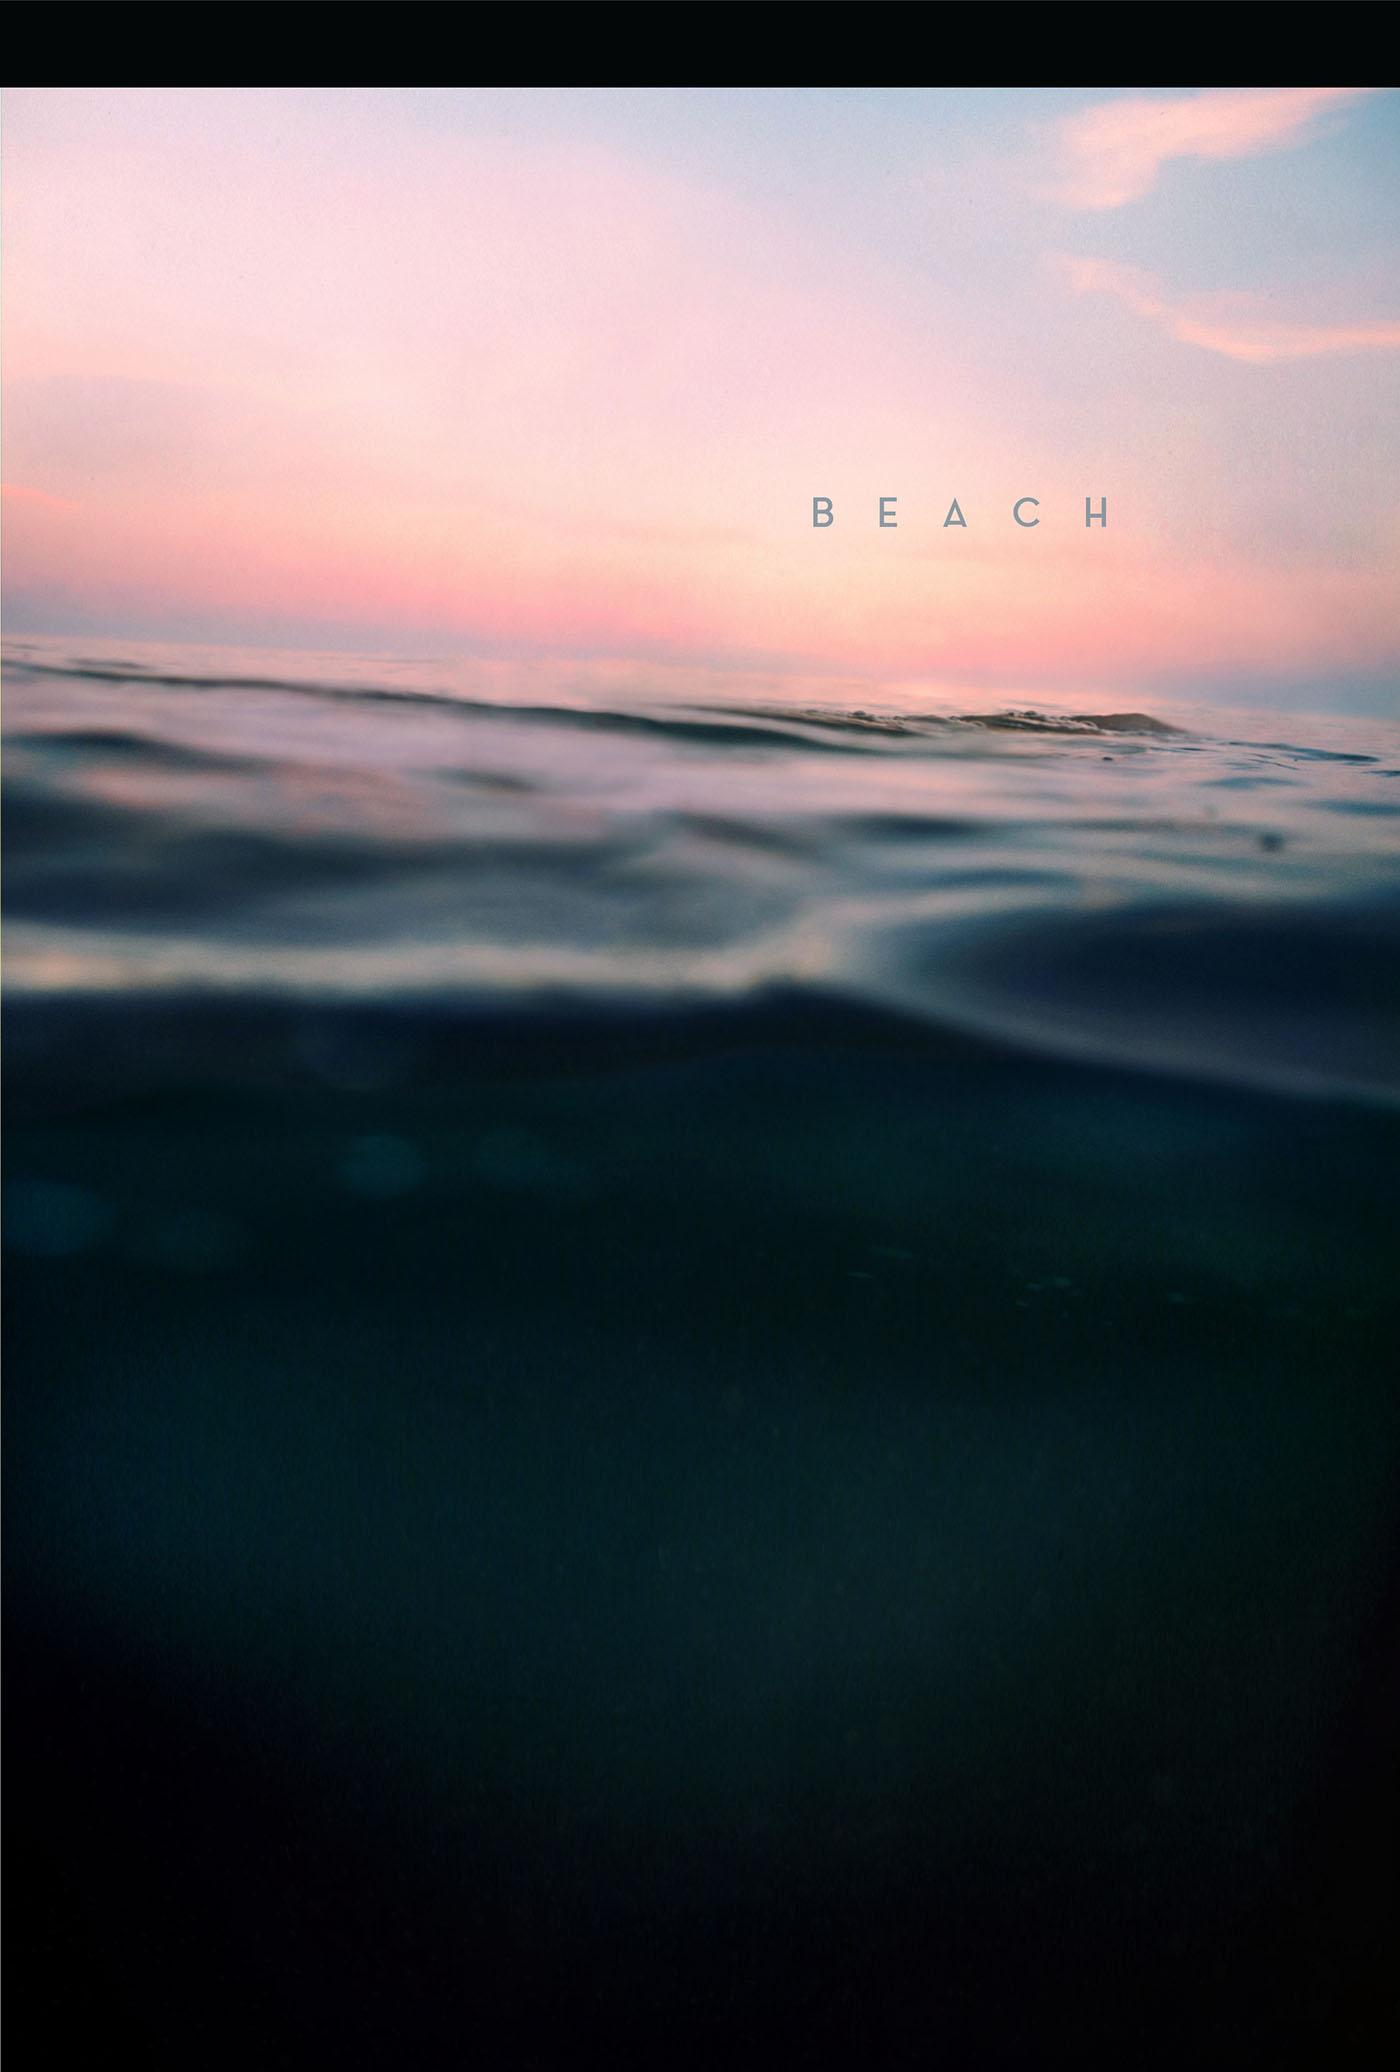 music video musician Case Study vfx break down behind the scenes Glitch 3D blackmagic camera  Ocean UNDERWATER PHOTOGRAPHY beach independant film album art personal branding motion